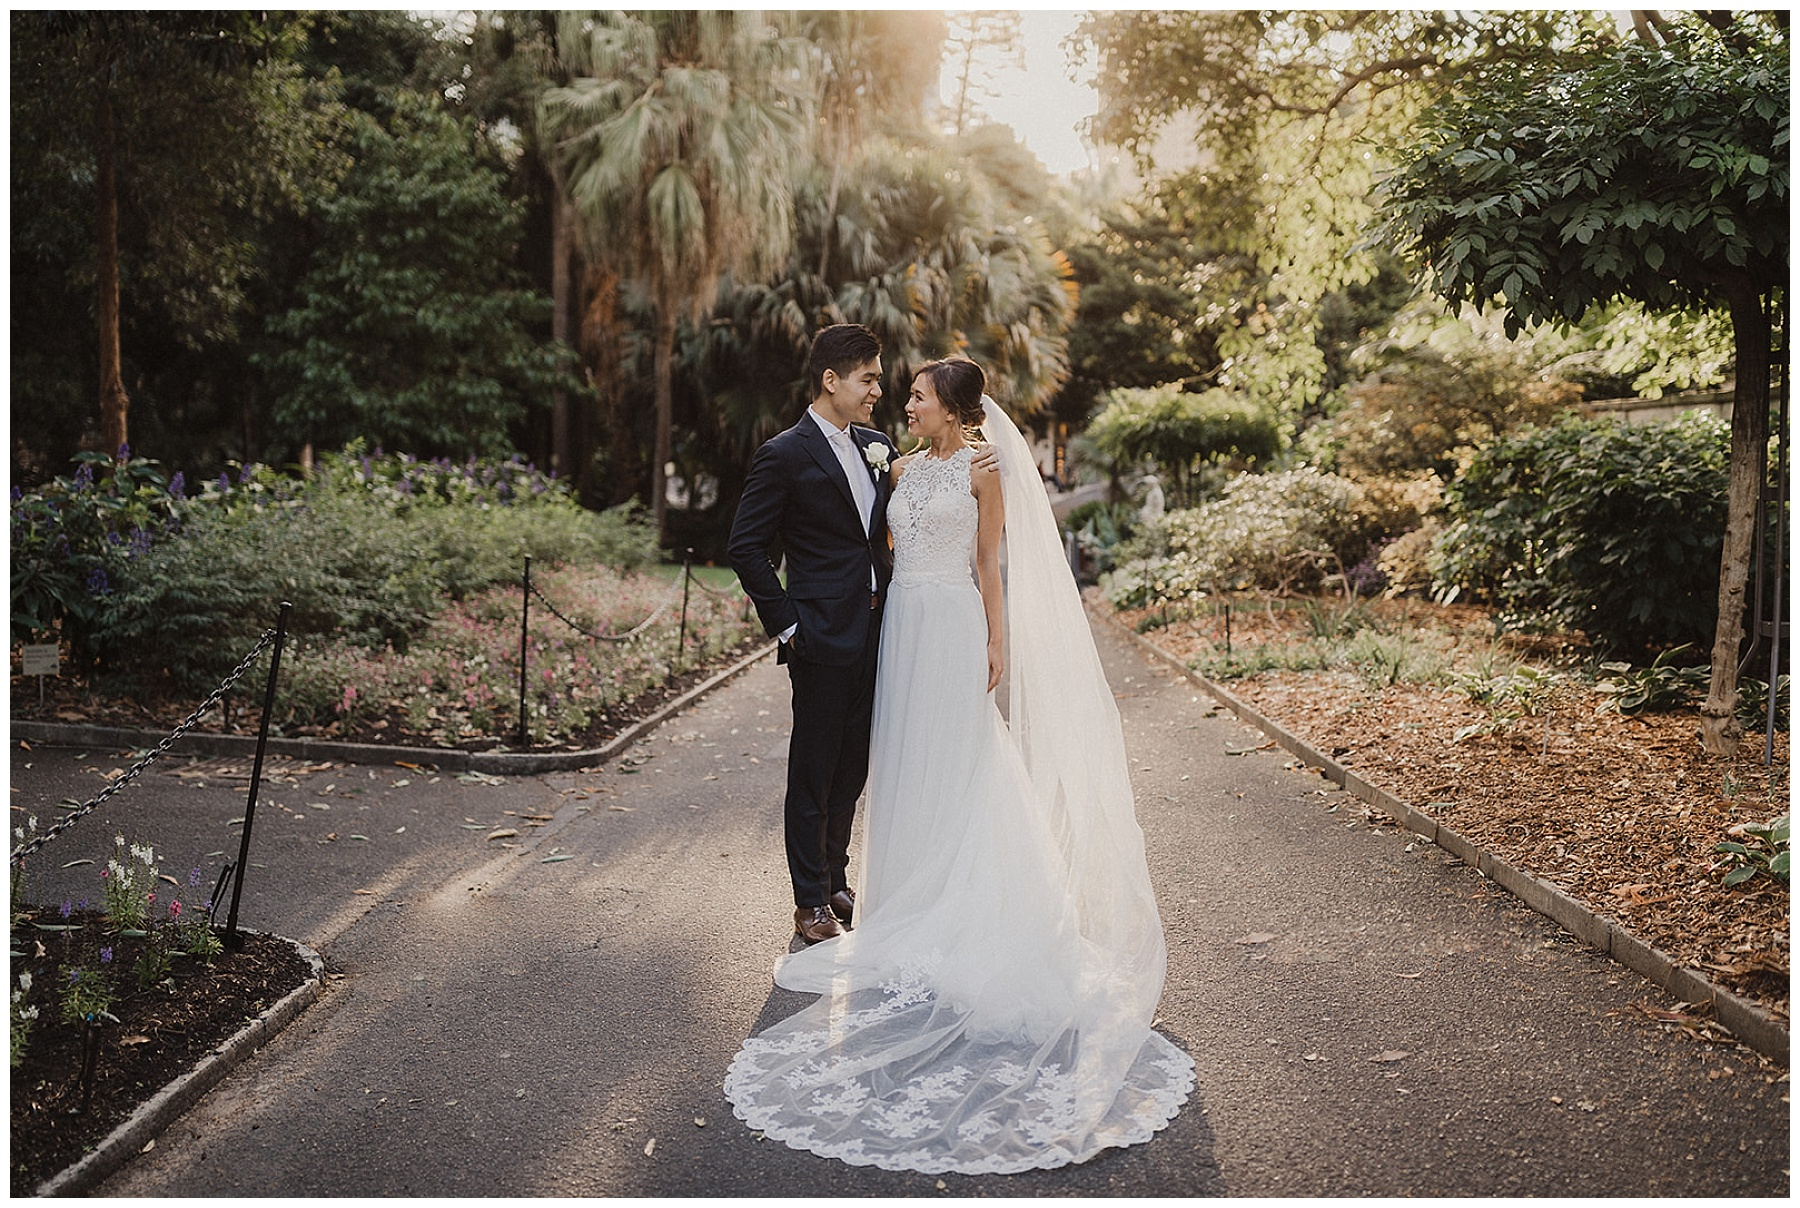 Sydney Bride and Groom in Botanical Gardens